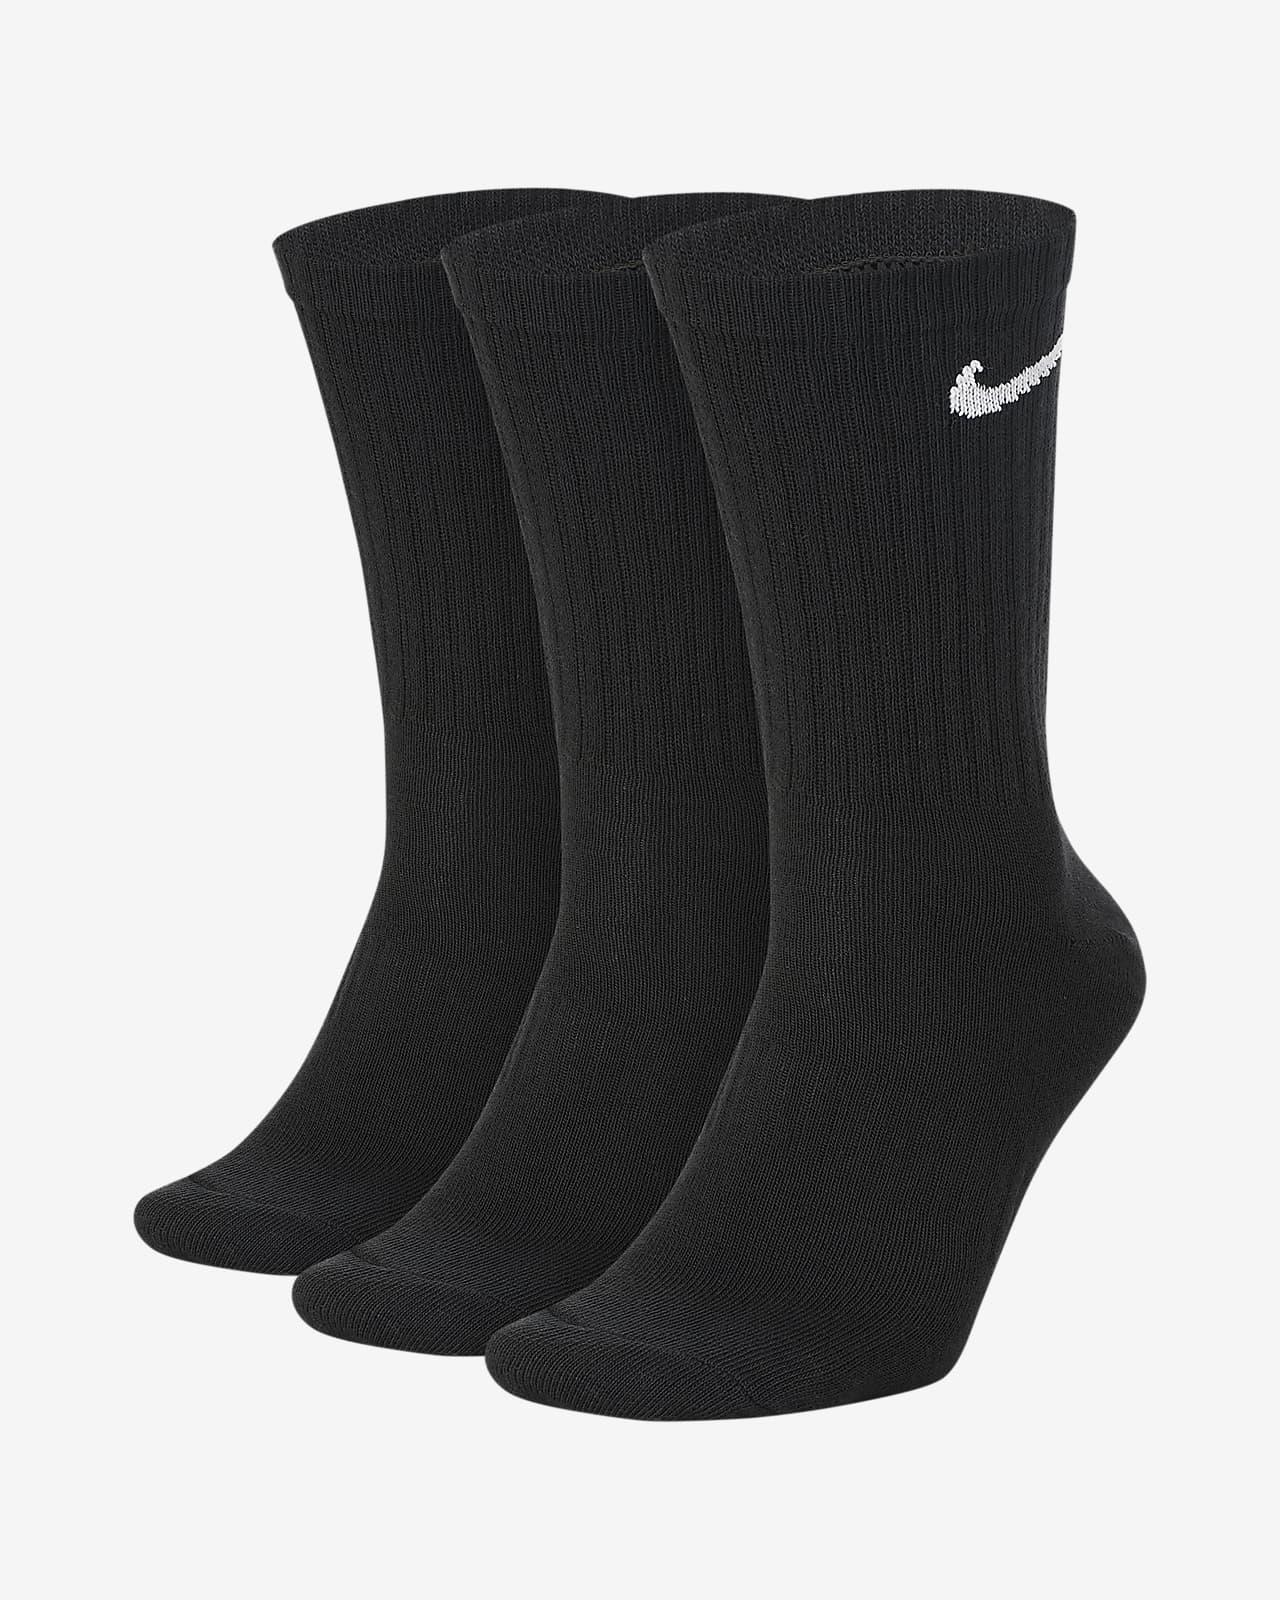 Nike Everyday Lightweight Training Crew Socks (3 Pairs)